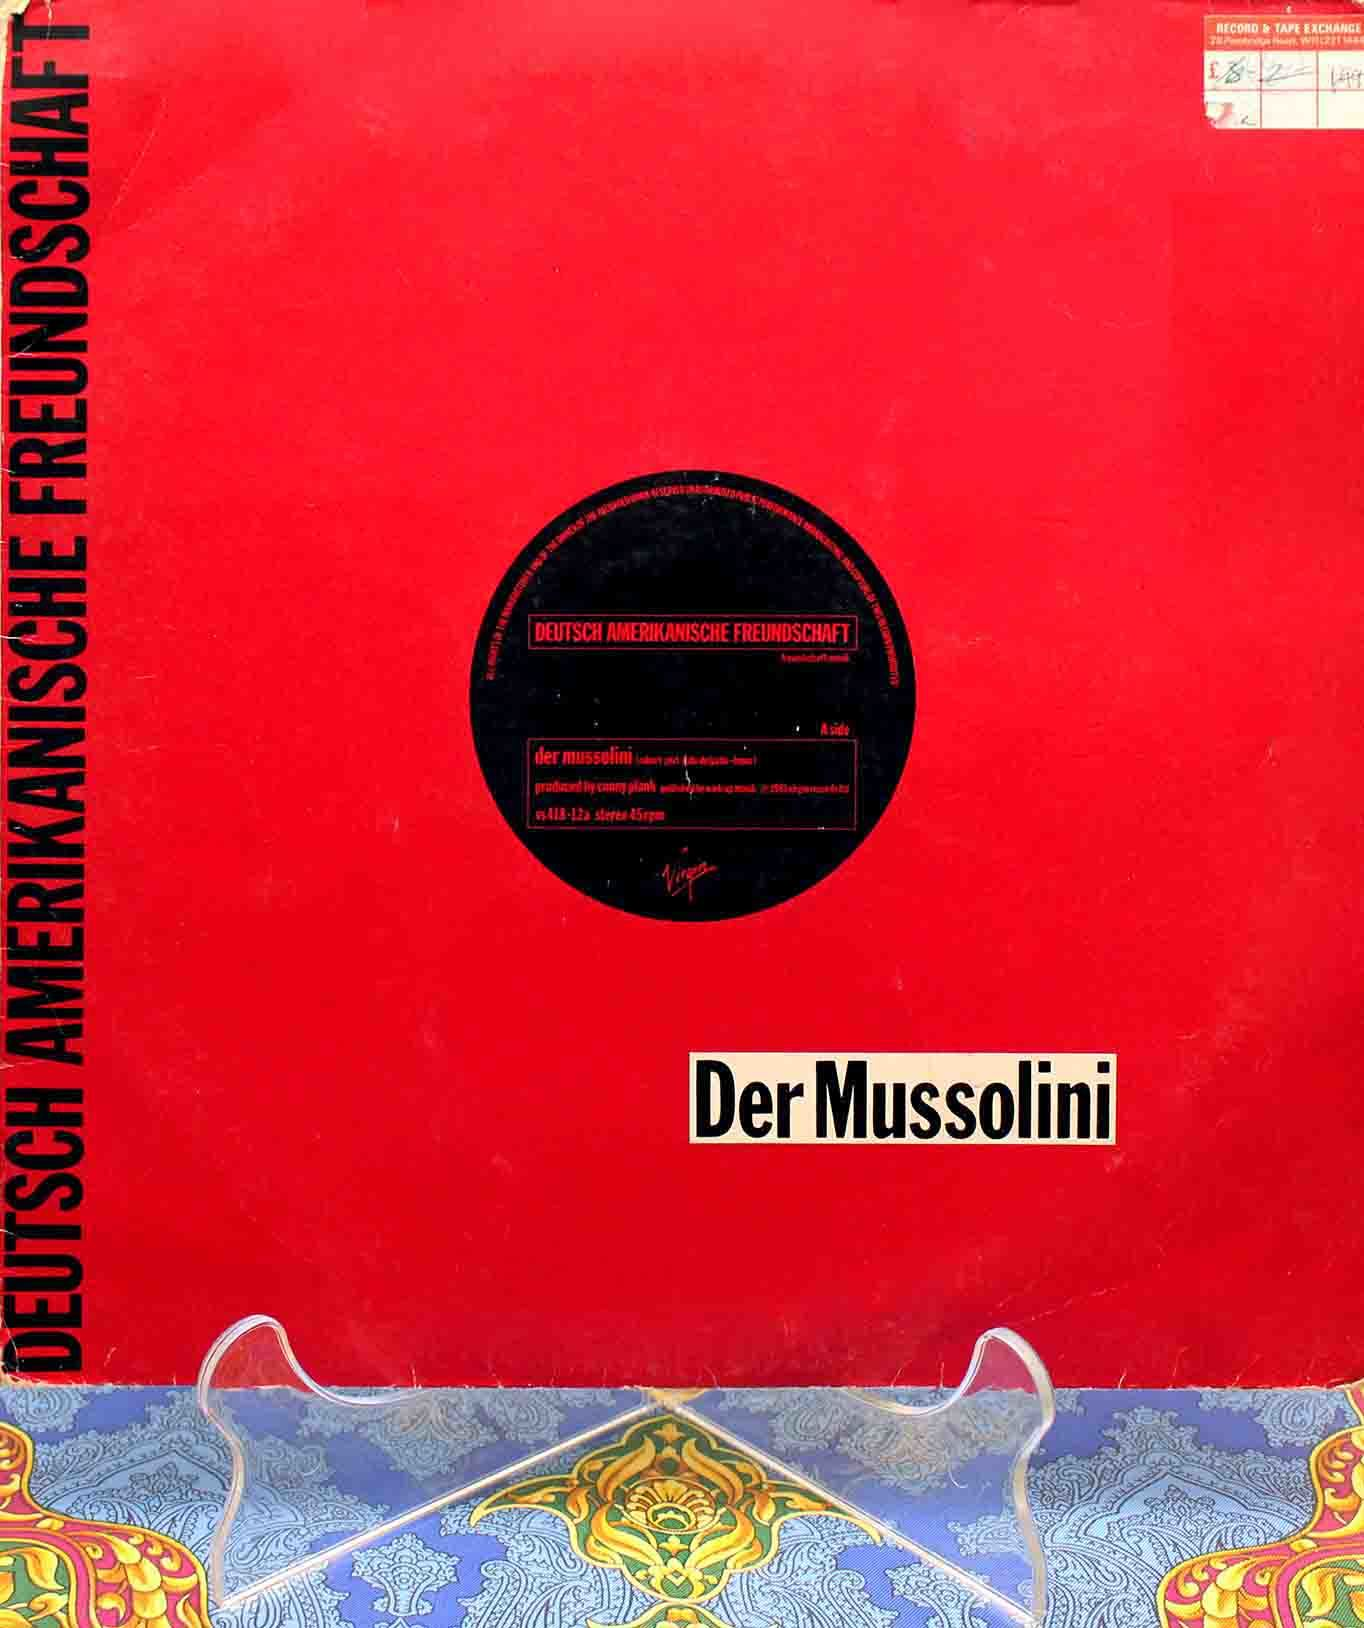 DAF - Der Mussolini 01